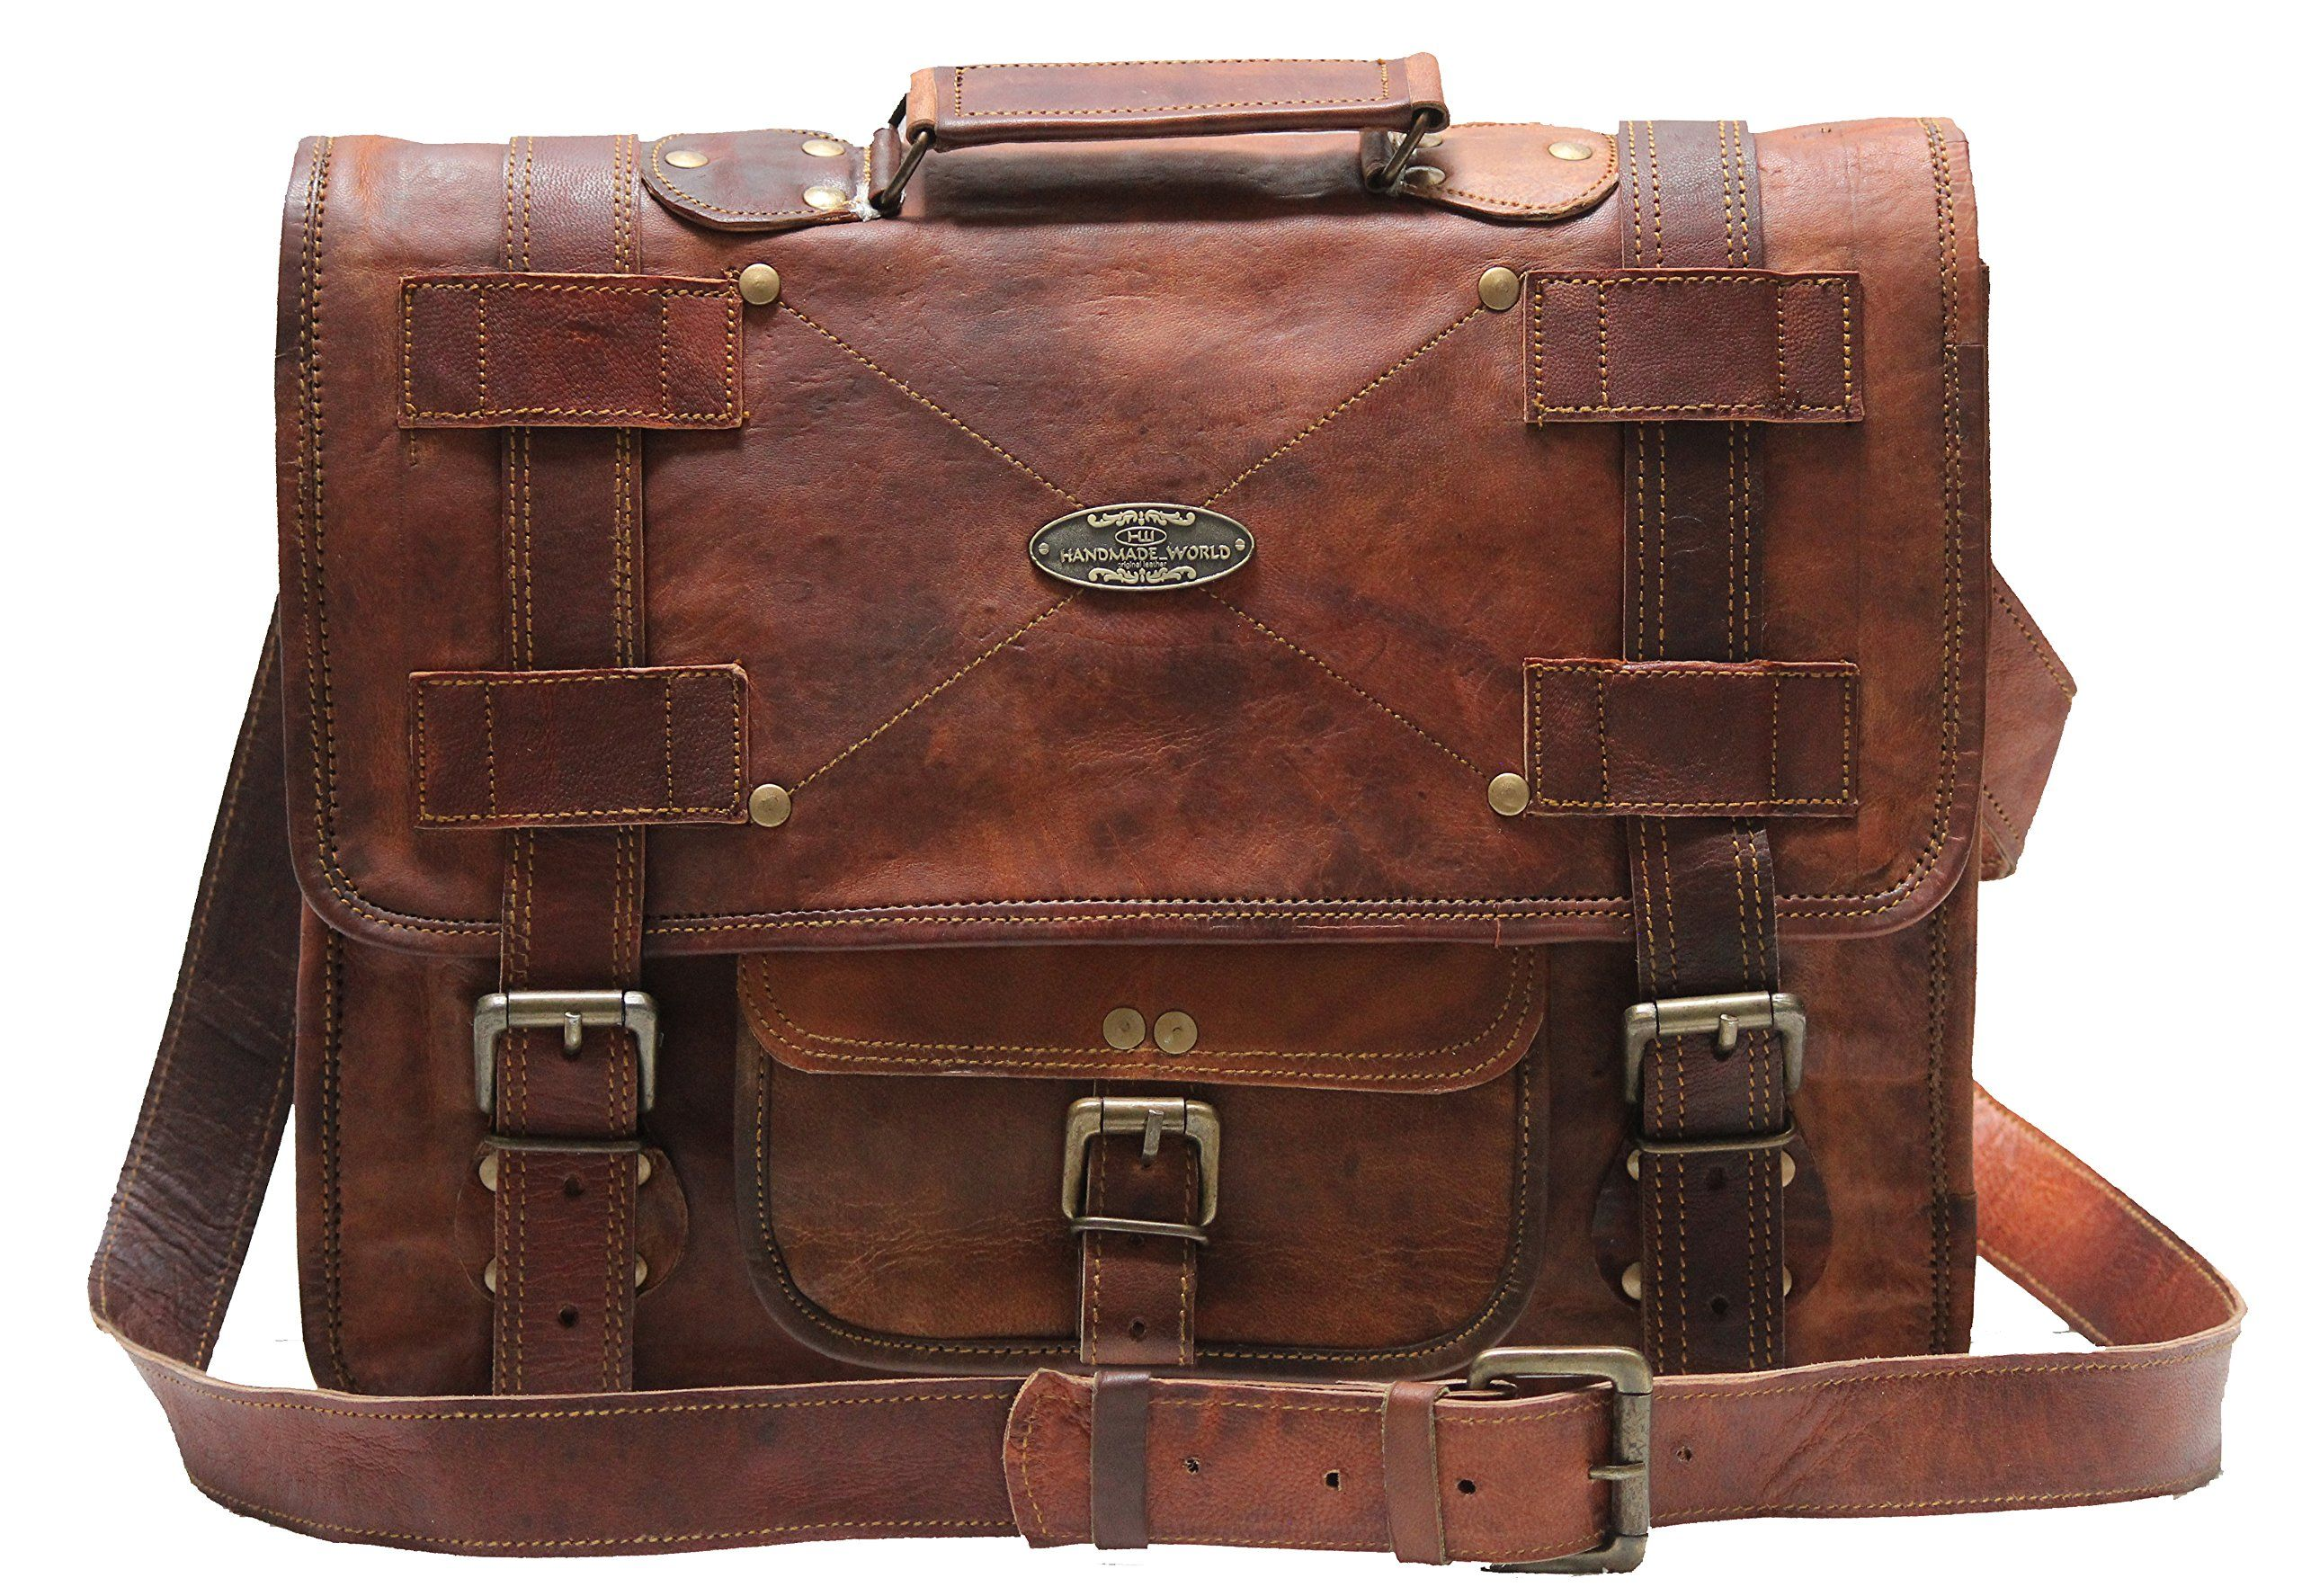 Handmade World Leather Messenger Bags For Men Women Mens Briefcase Laptop Bag Best Computer Shoulder Satchel School Distressed 13 X 18